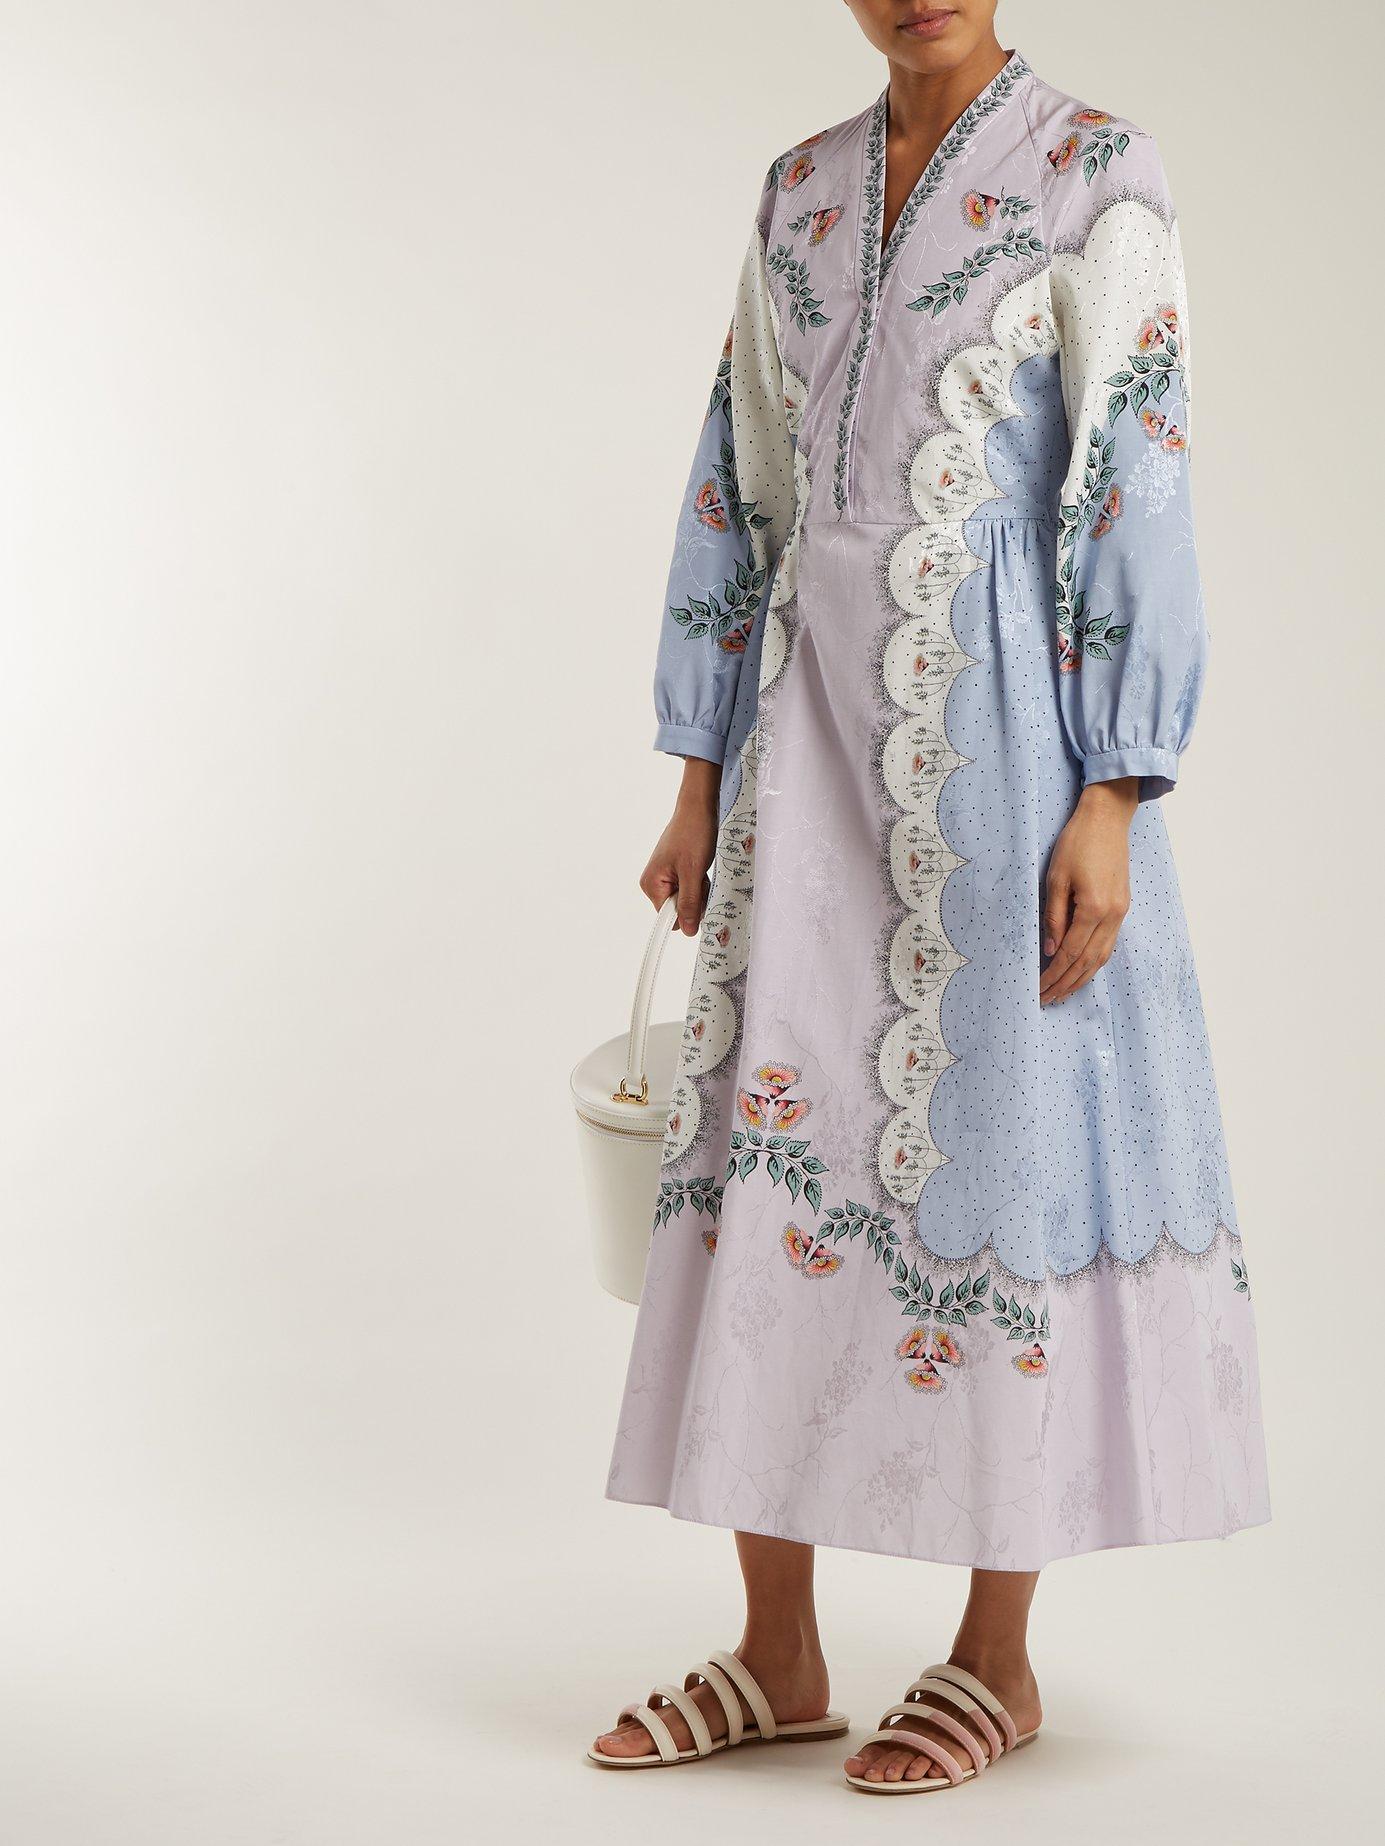 Estella floral-print dress by Vilshenko